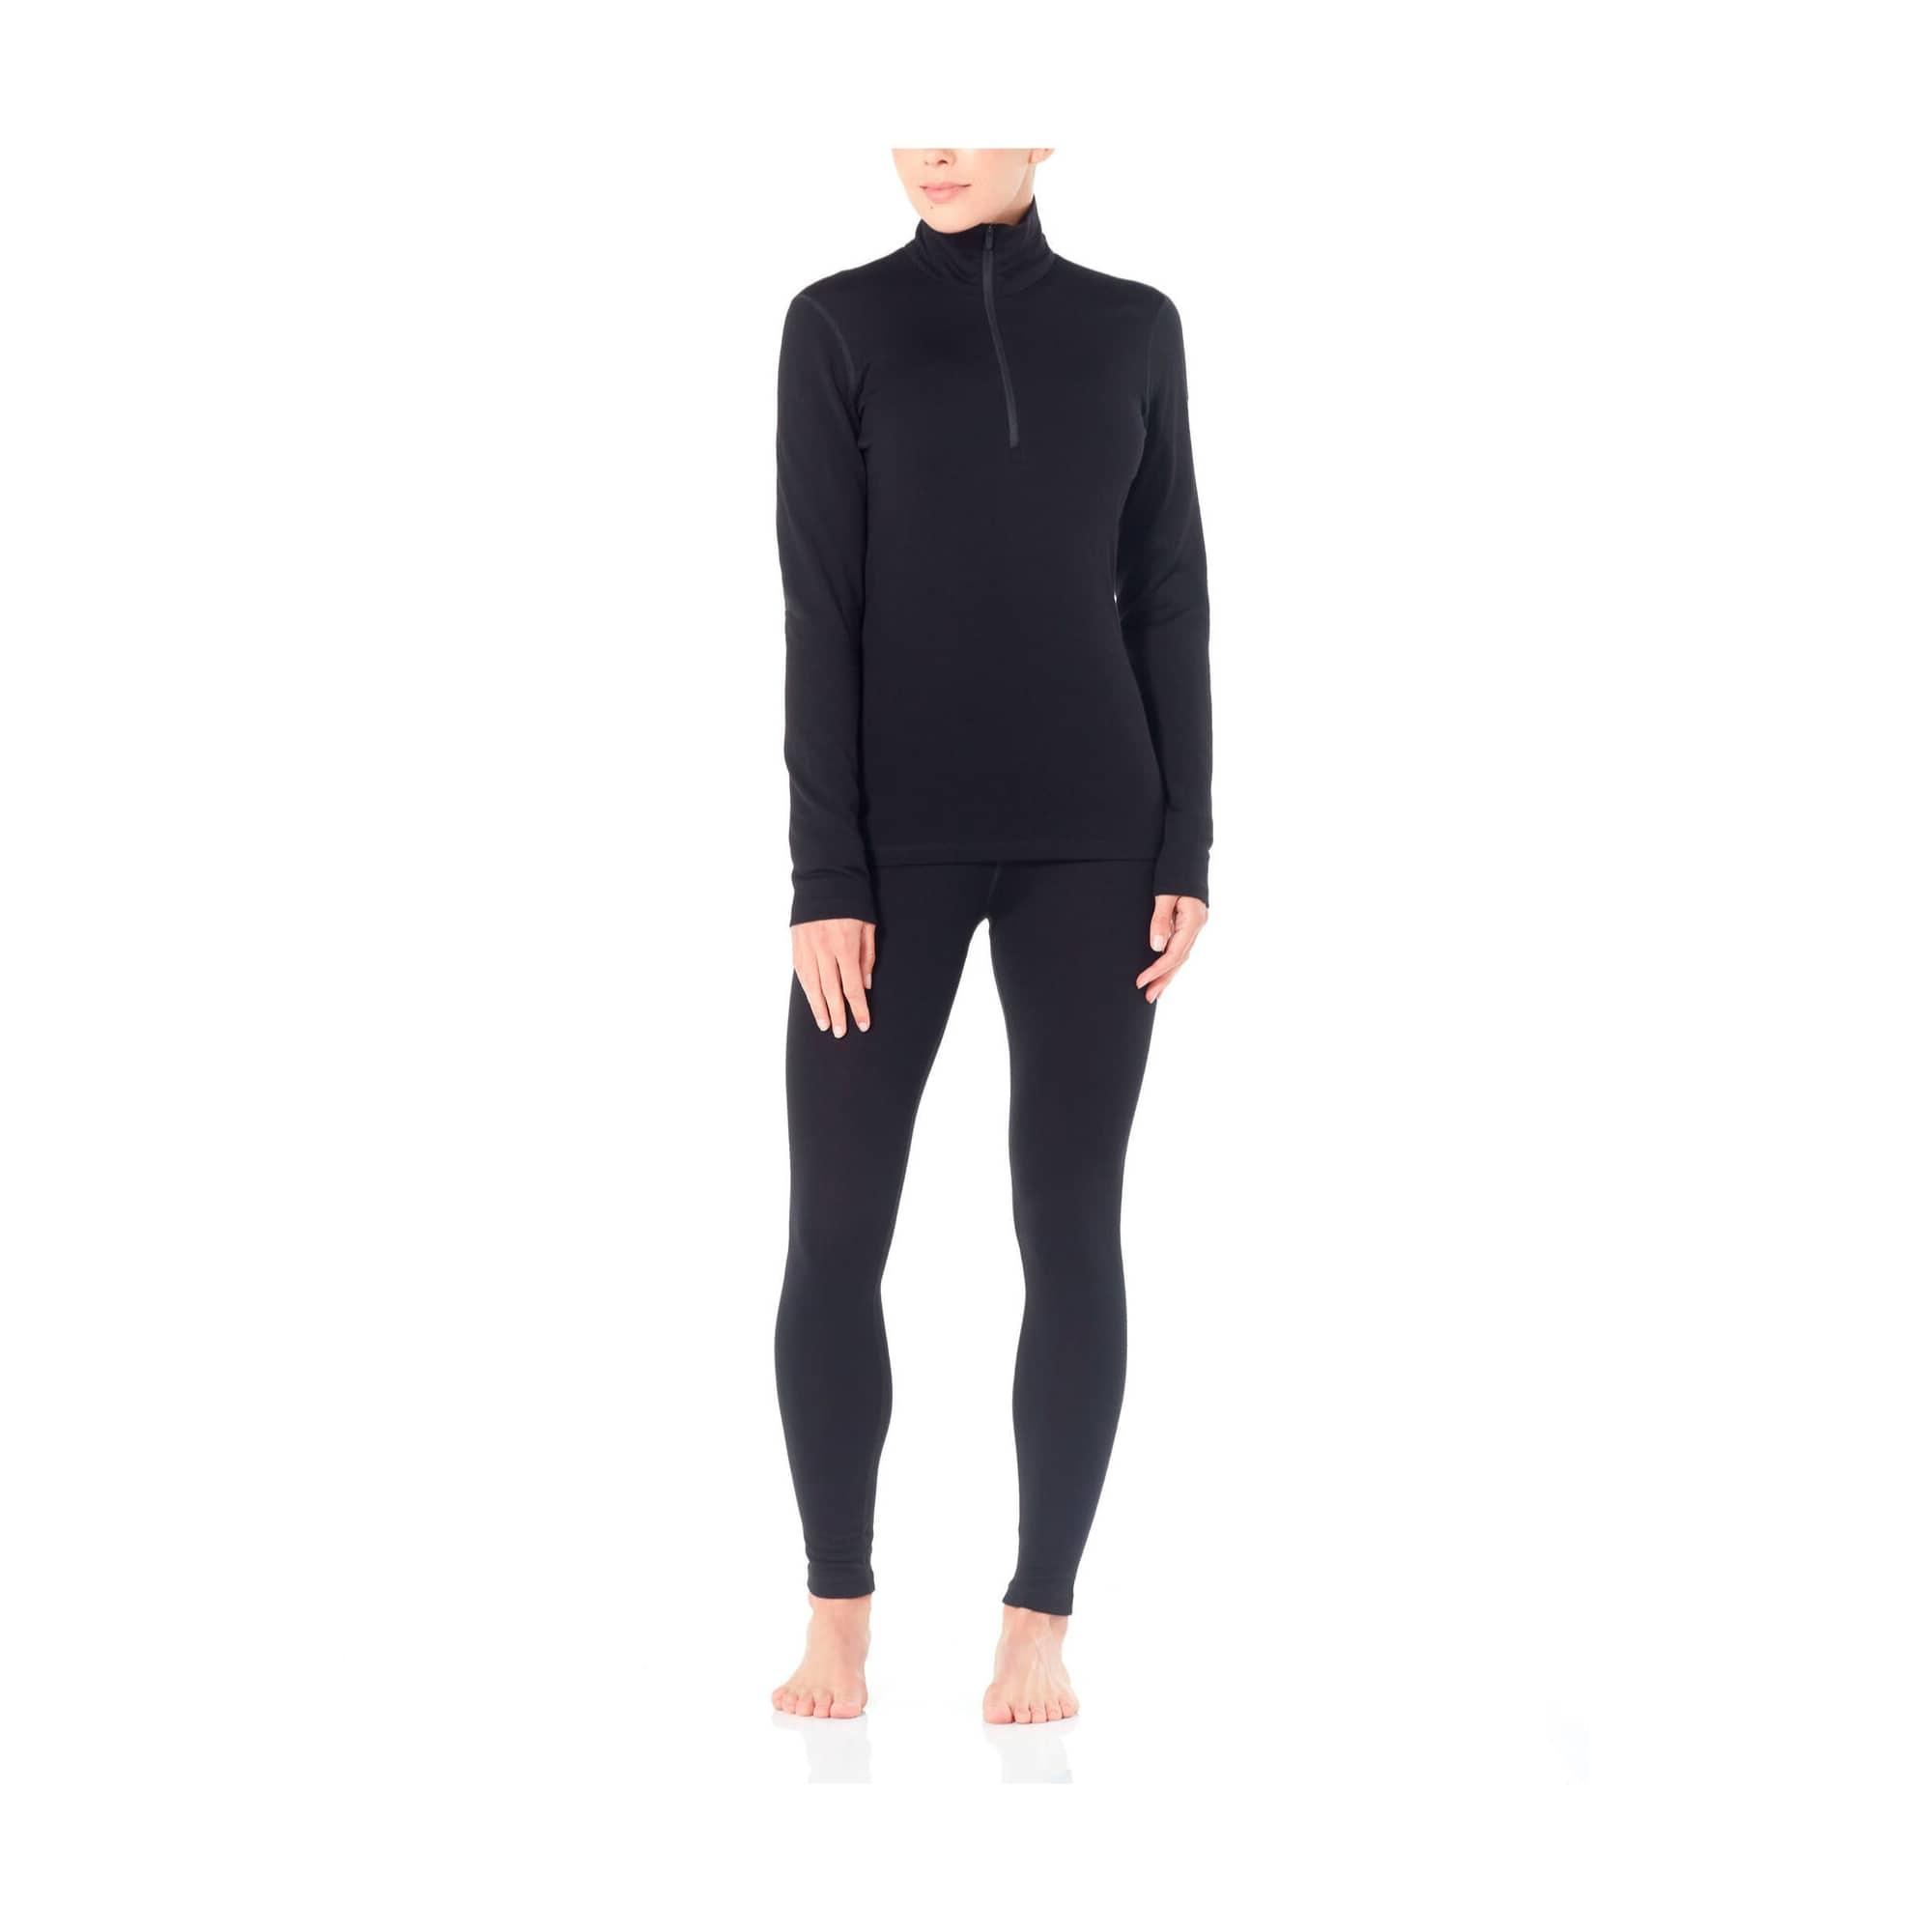 Women's 260 Tech Long Sleeve Half Zip-4